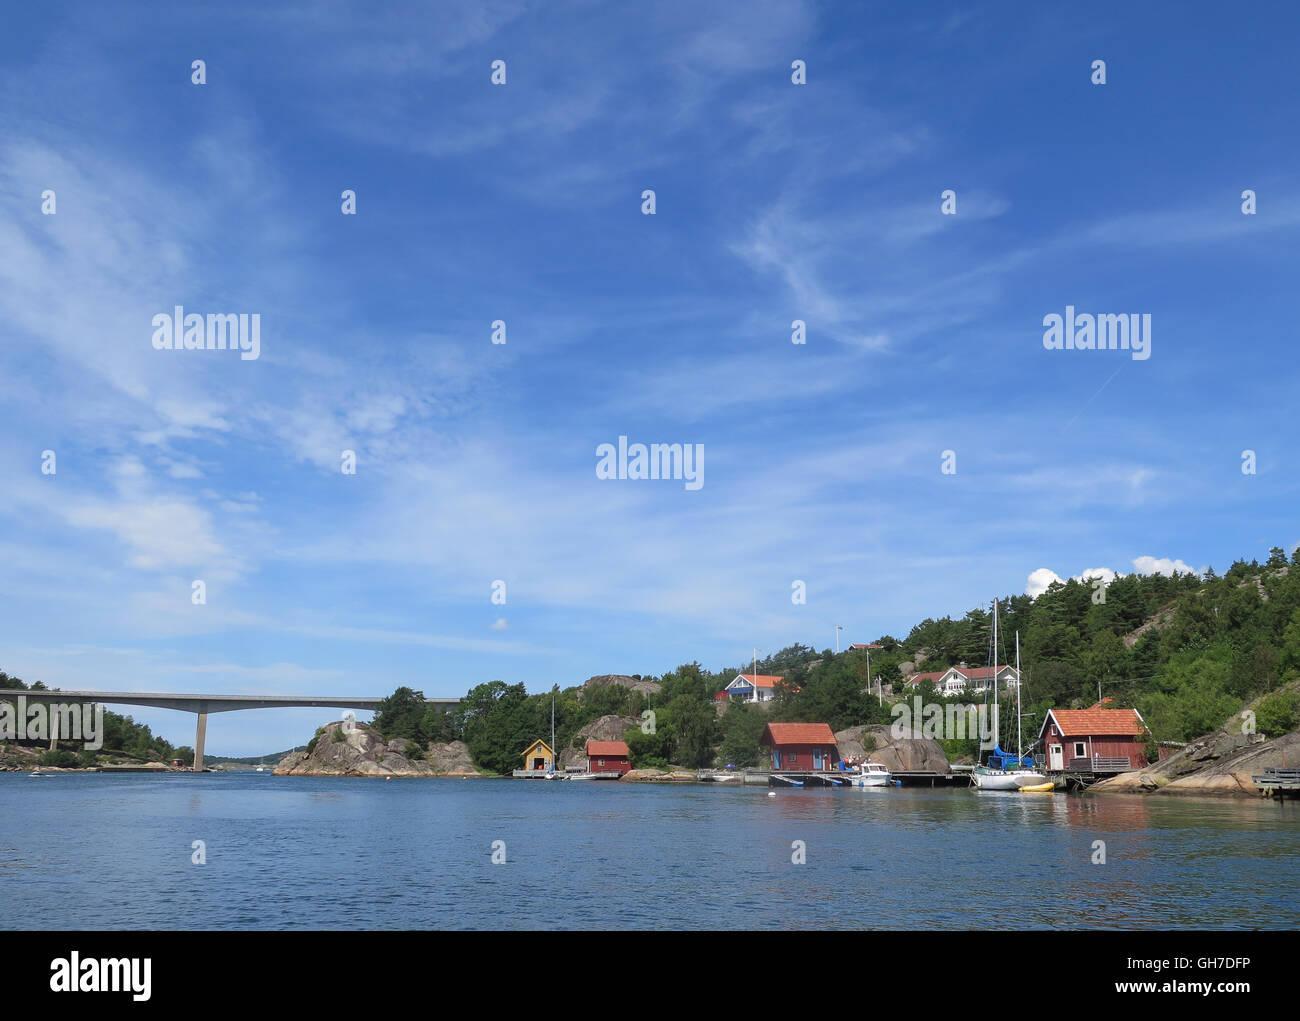 The bridge between orust and tjörn on swedish westcoast - Stock Image